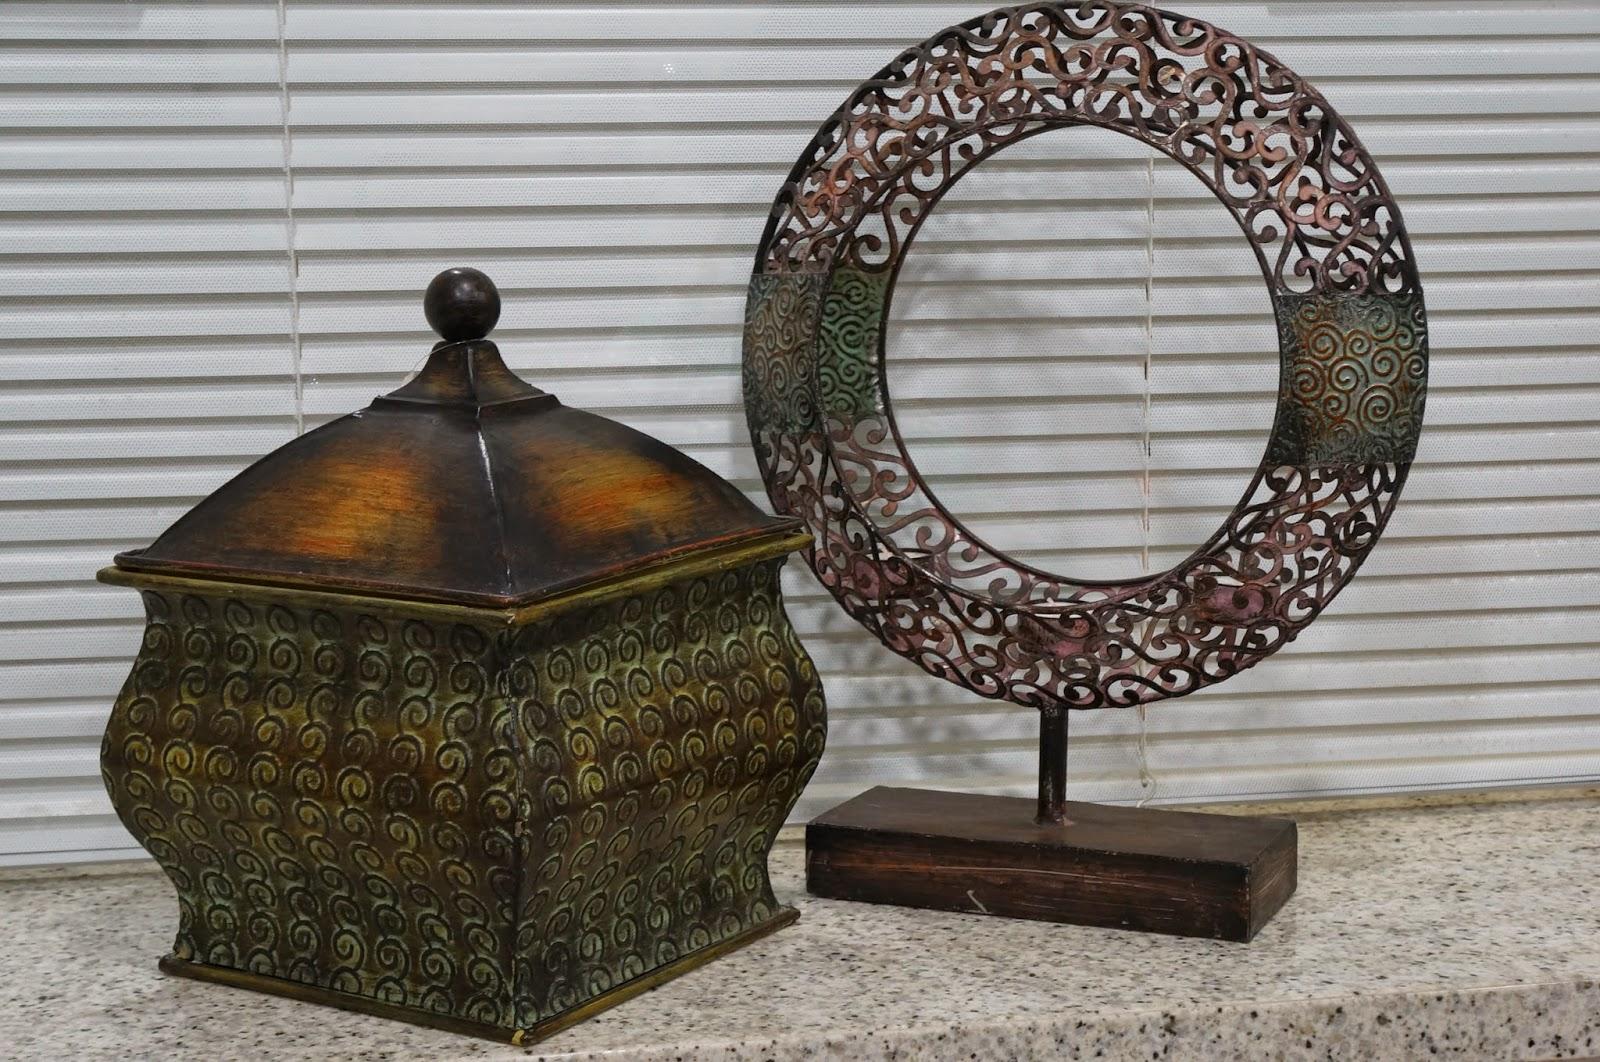 cesto de ferro e mandala de velas - loja Flor de Malagueta